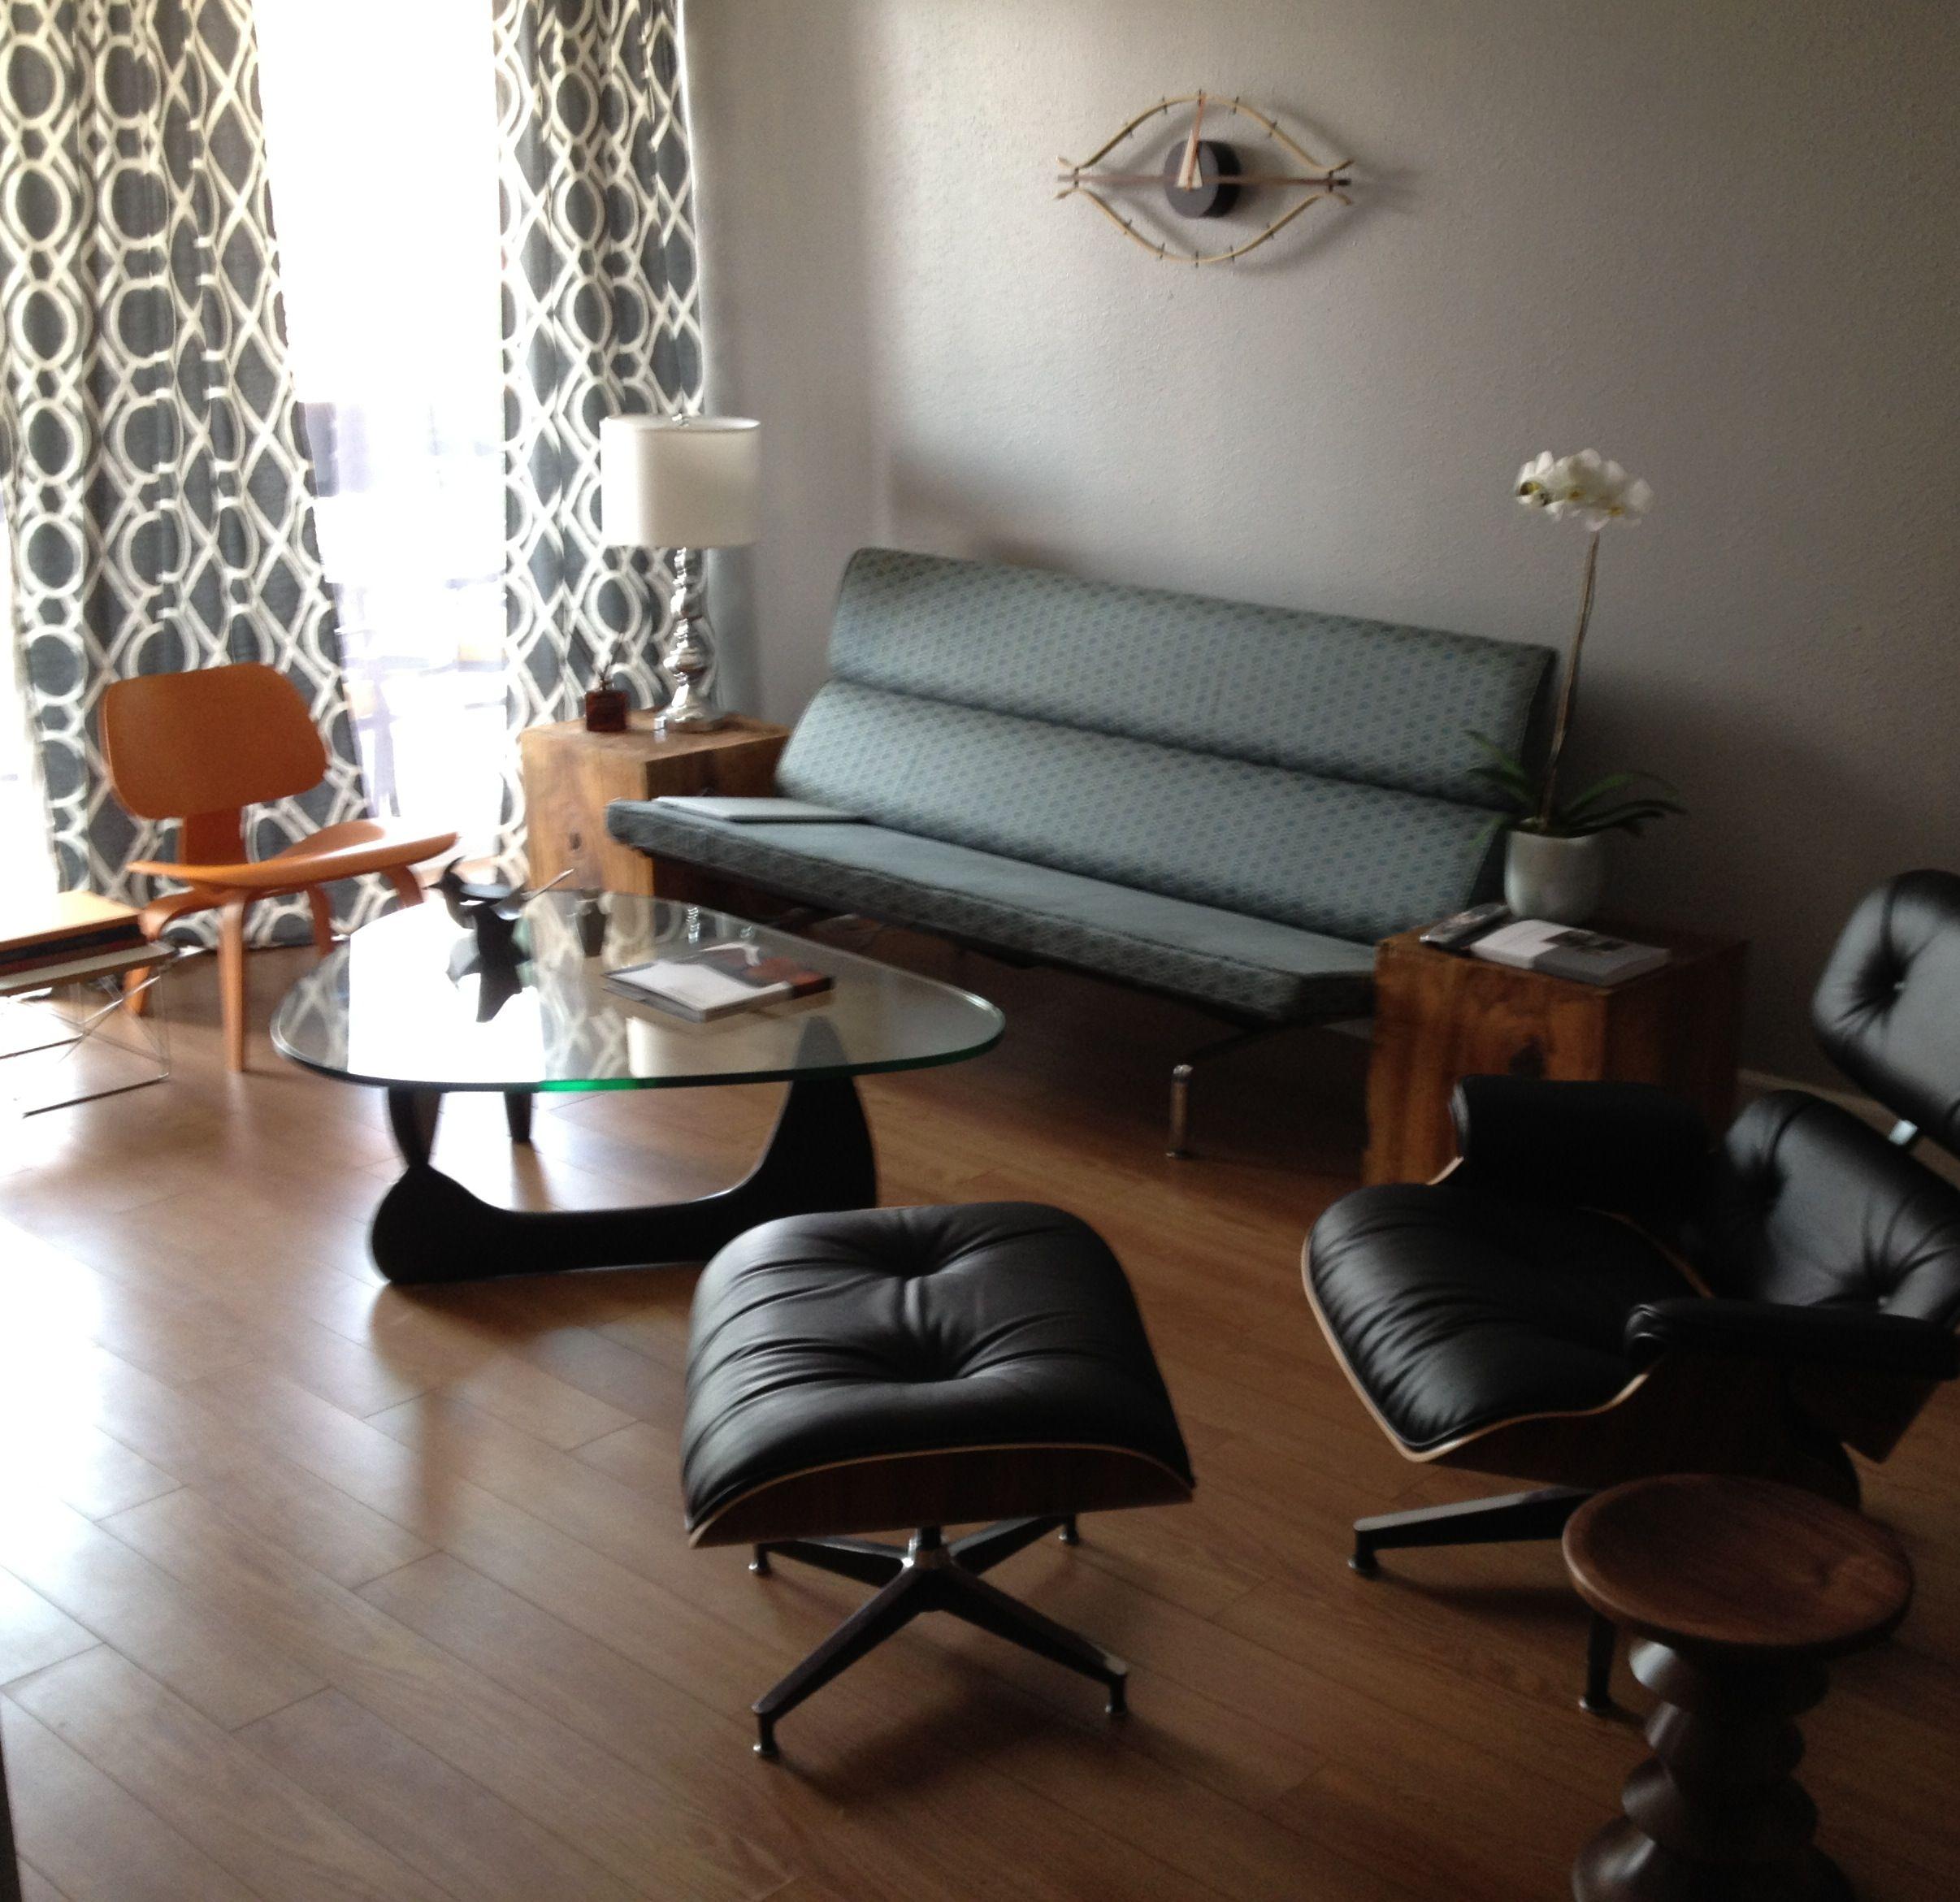 Eames Sofa Compact Orange Lcw Eames Lounge Chair Noguchi Table